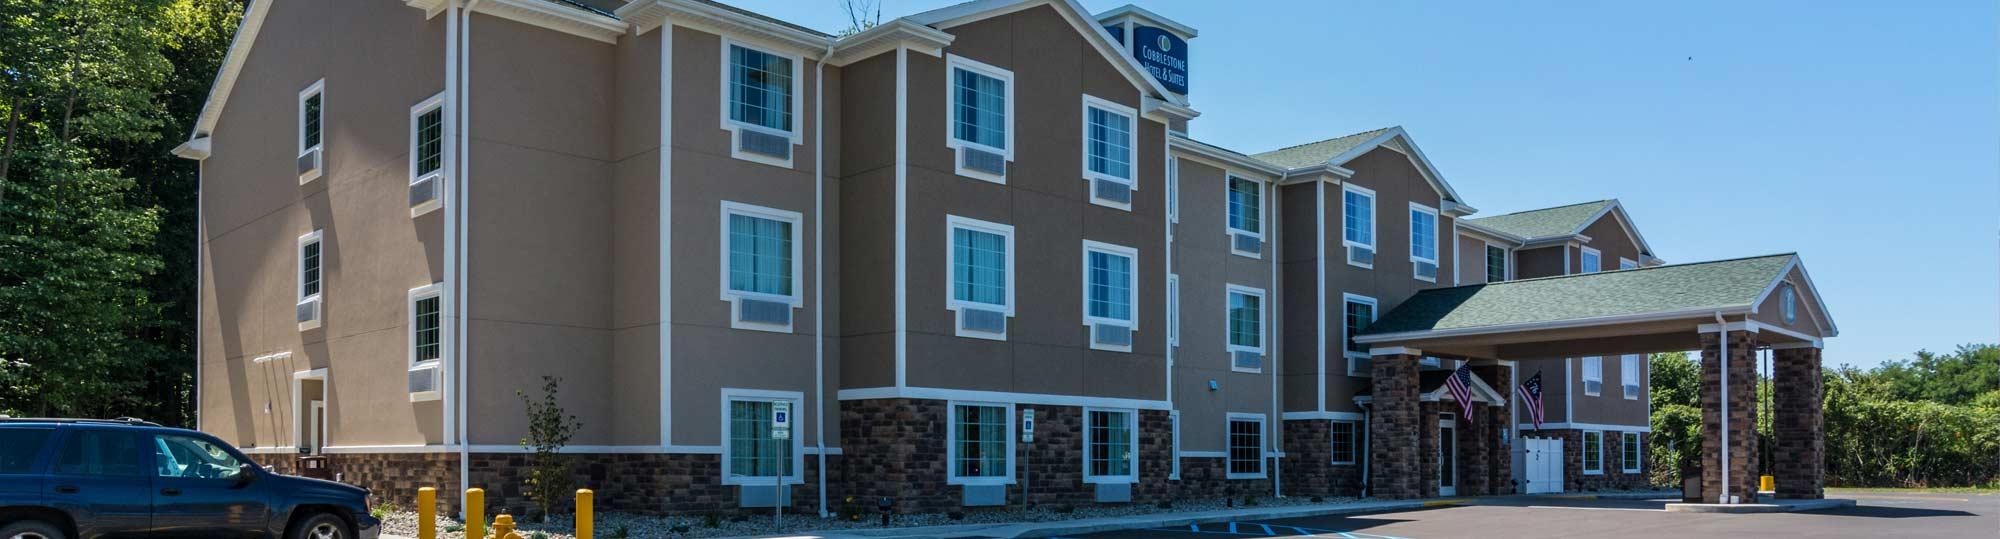 Cobblestone Hotel & Suites Greenville